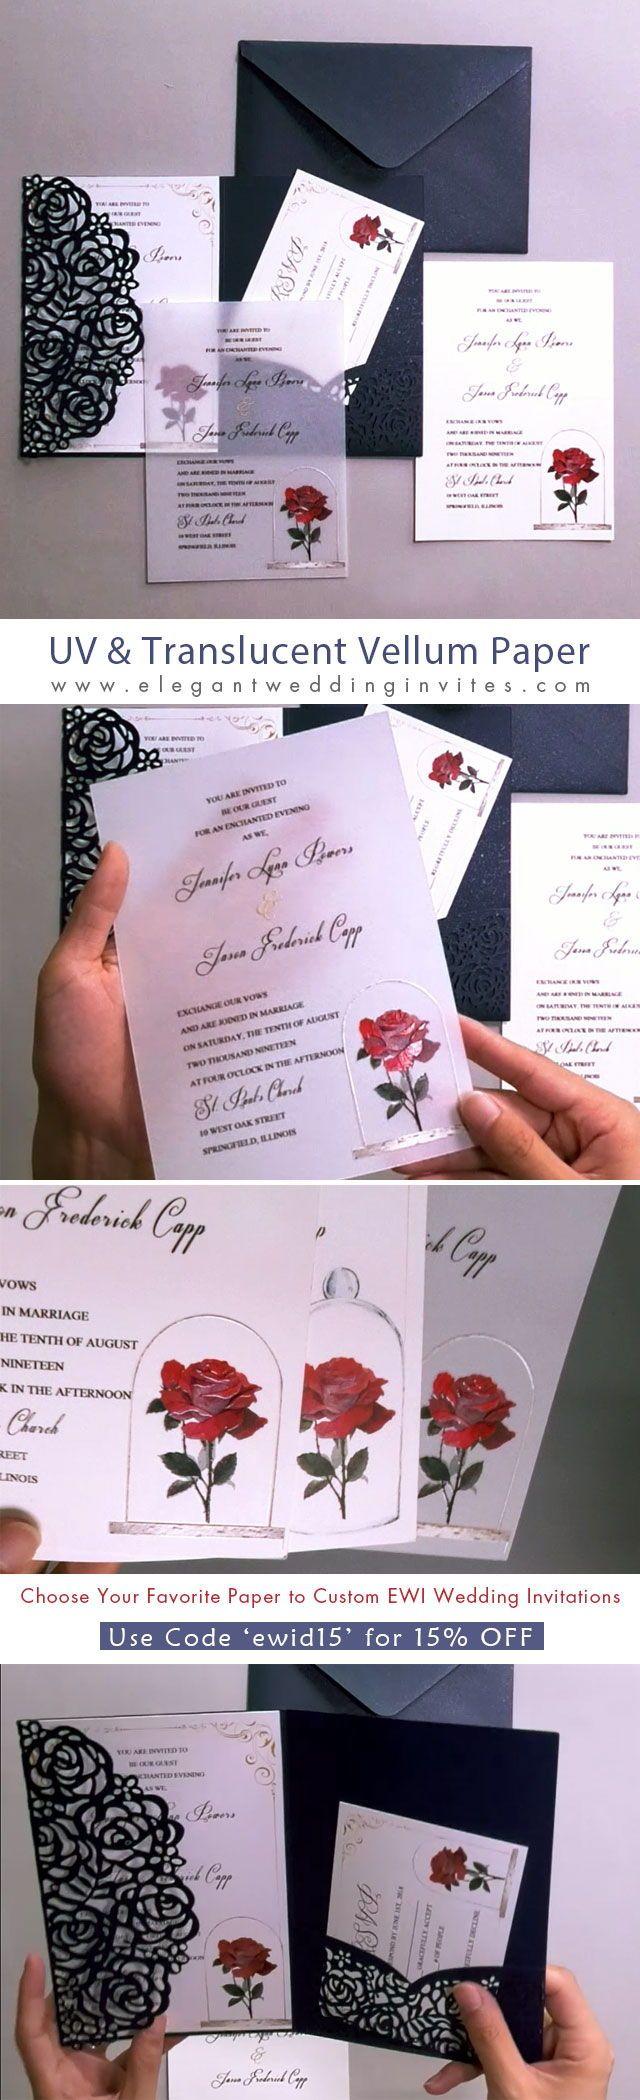 Jeanus bouquet u pink and purple floral uv printed wedding